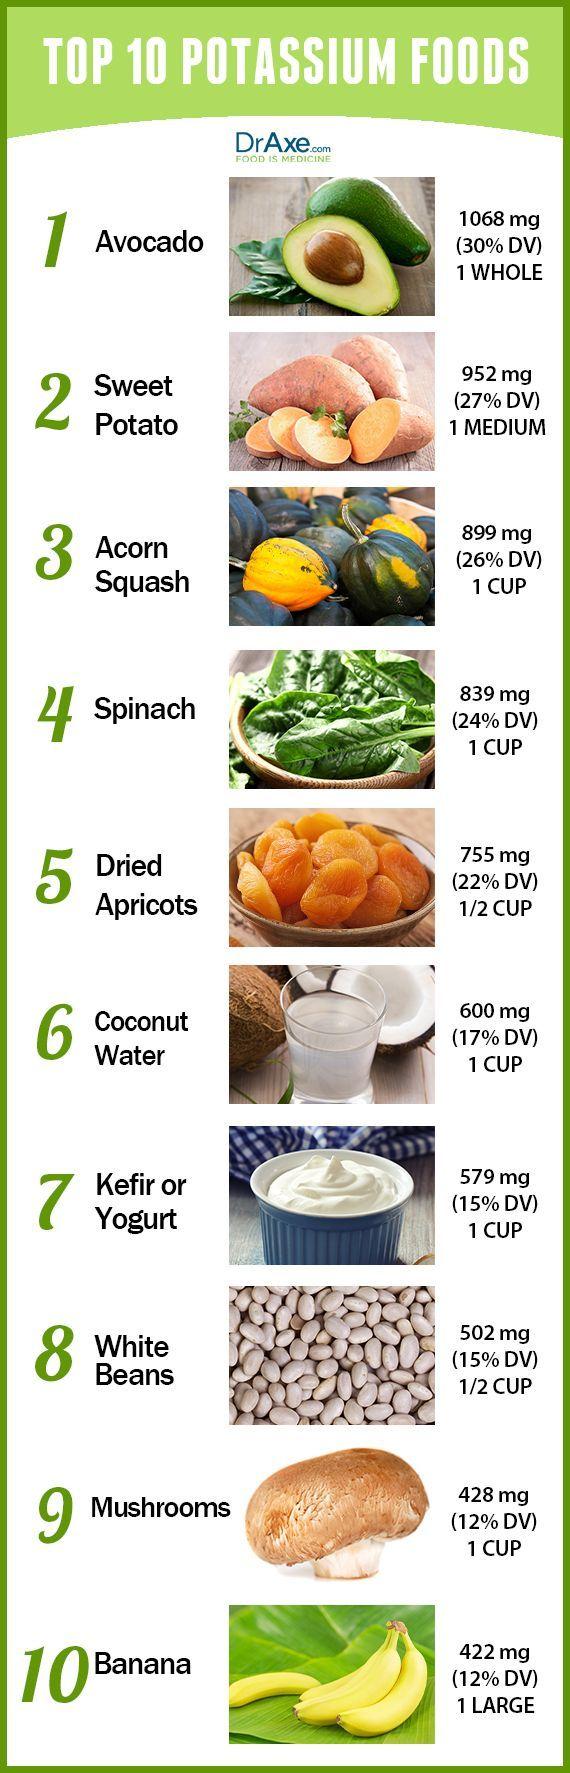 Top 10 potassium foods